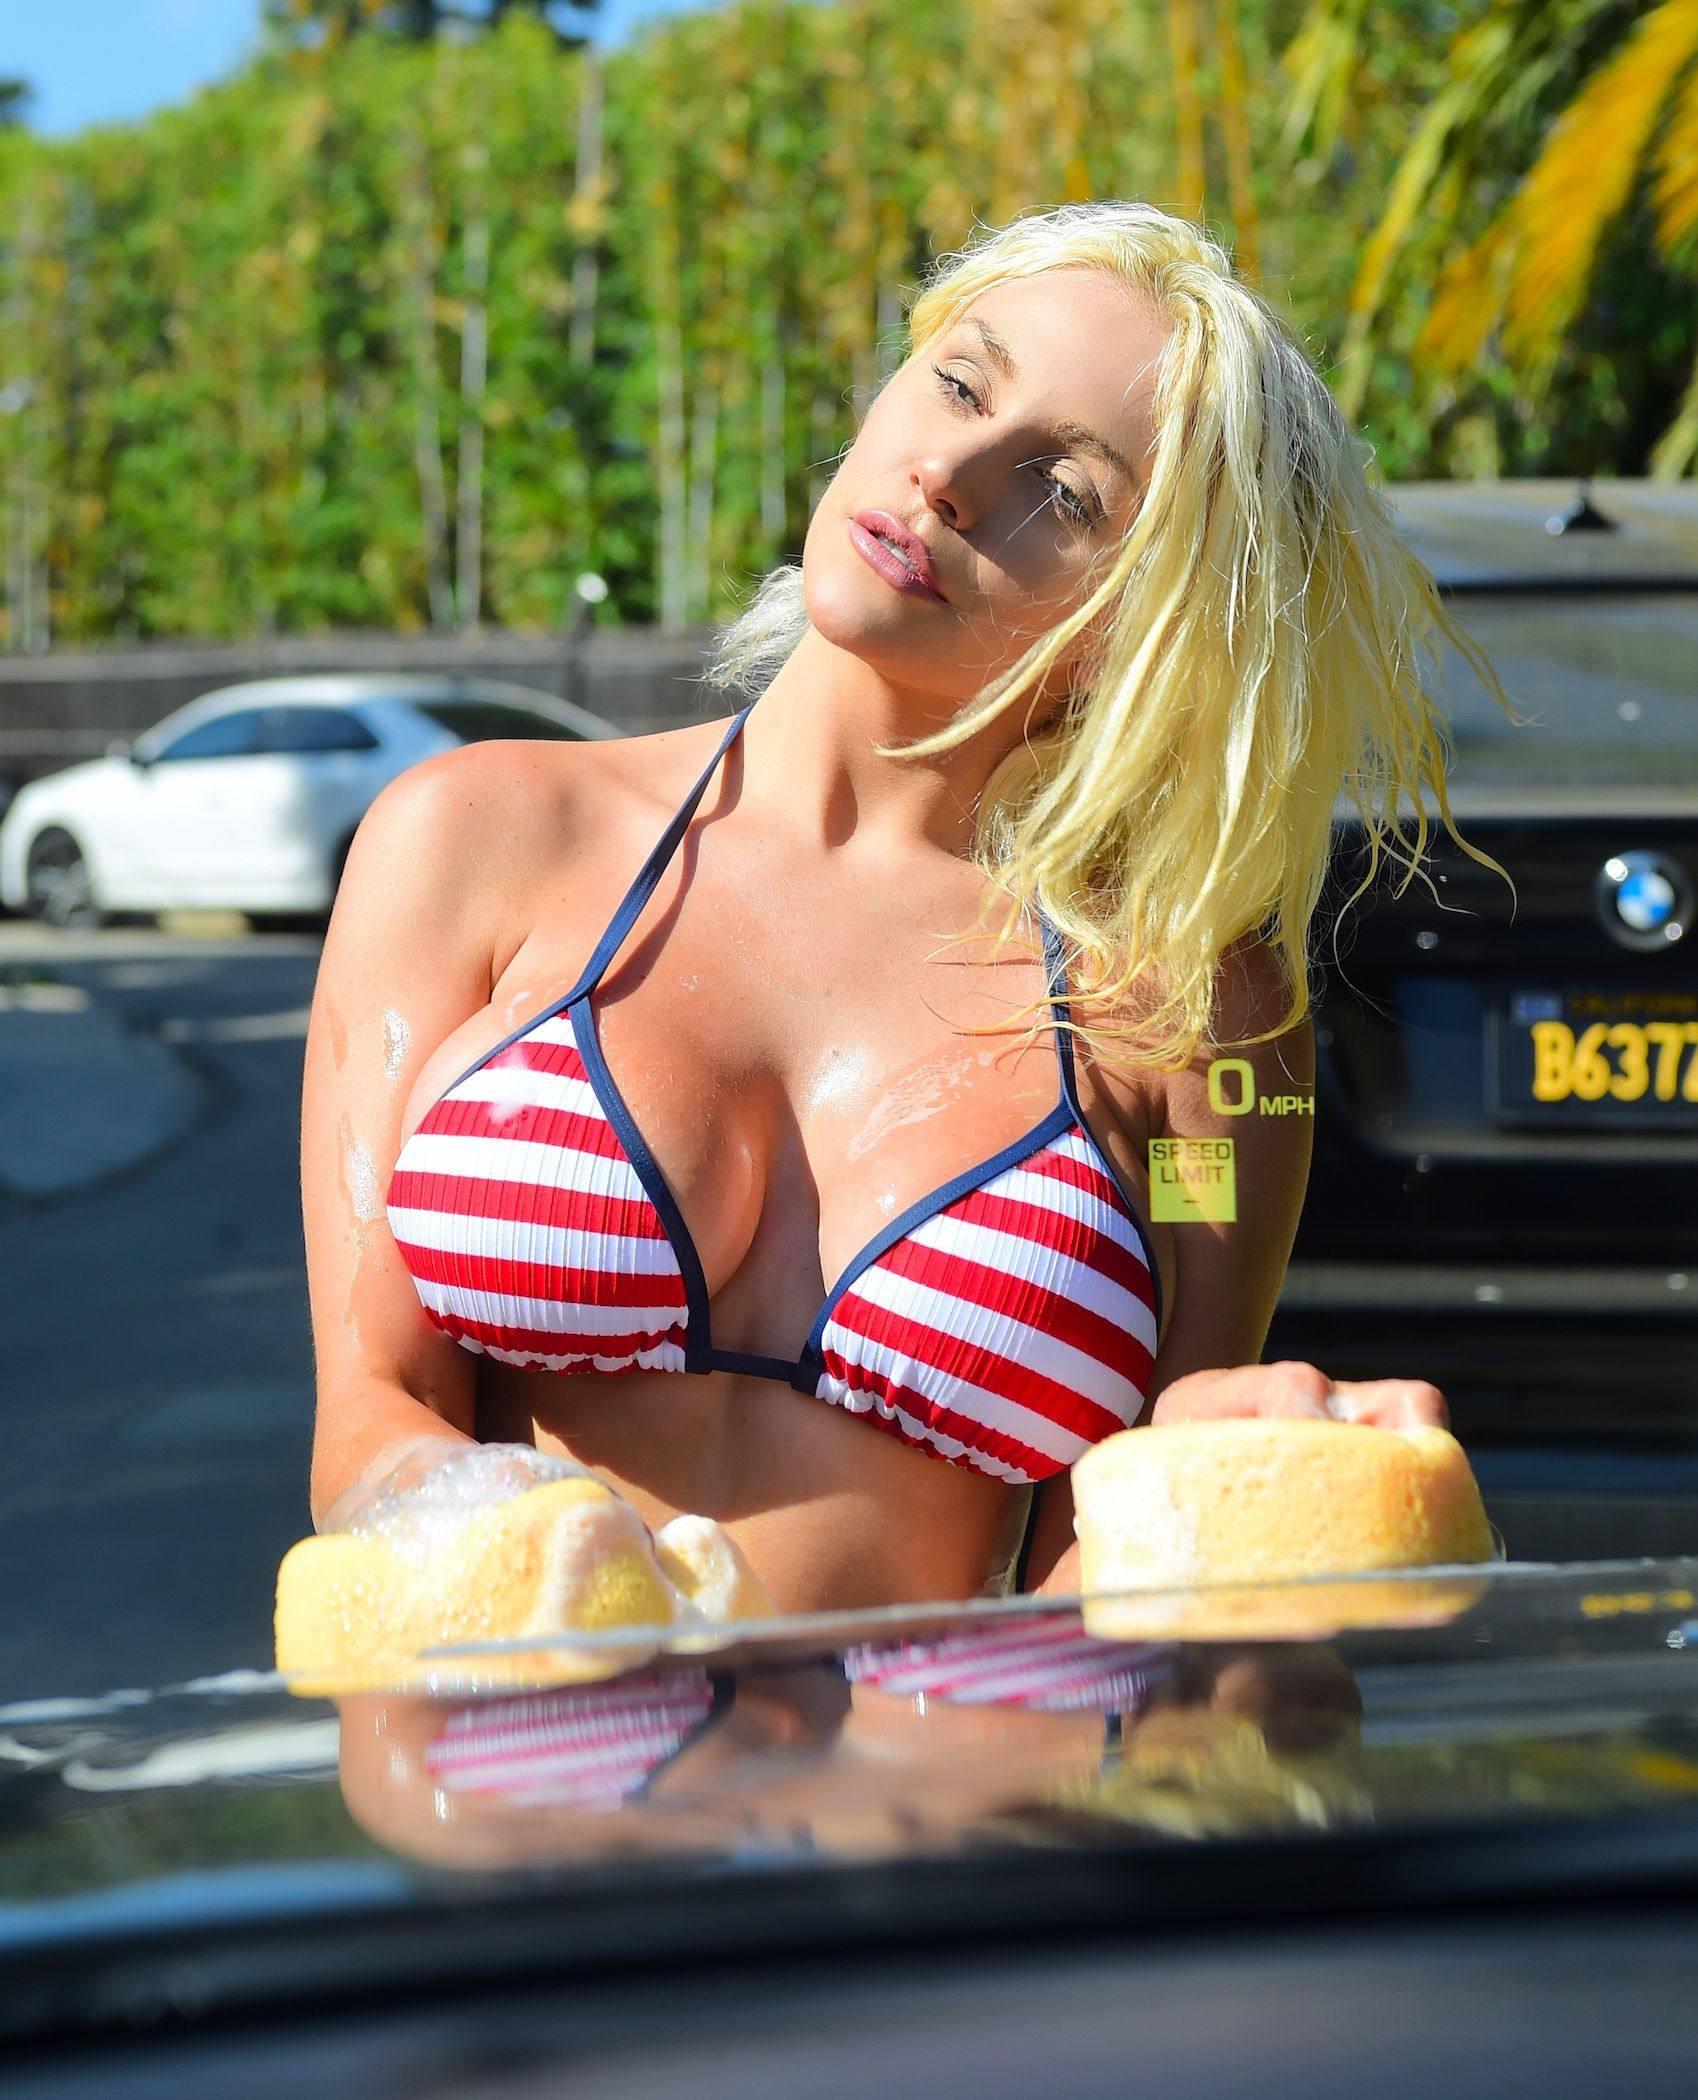 Courtney Stodden Huge Breasts